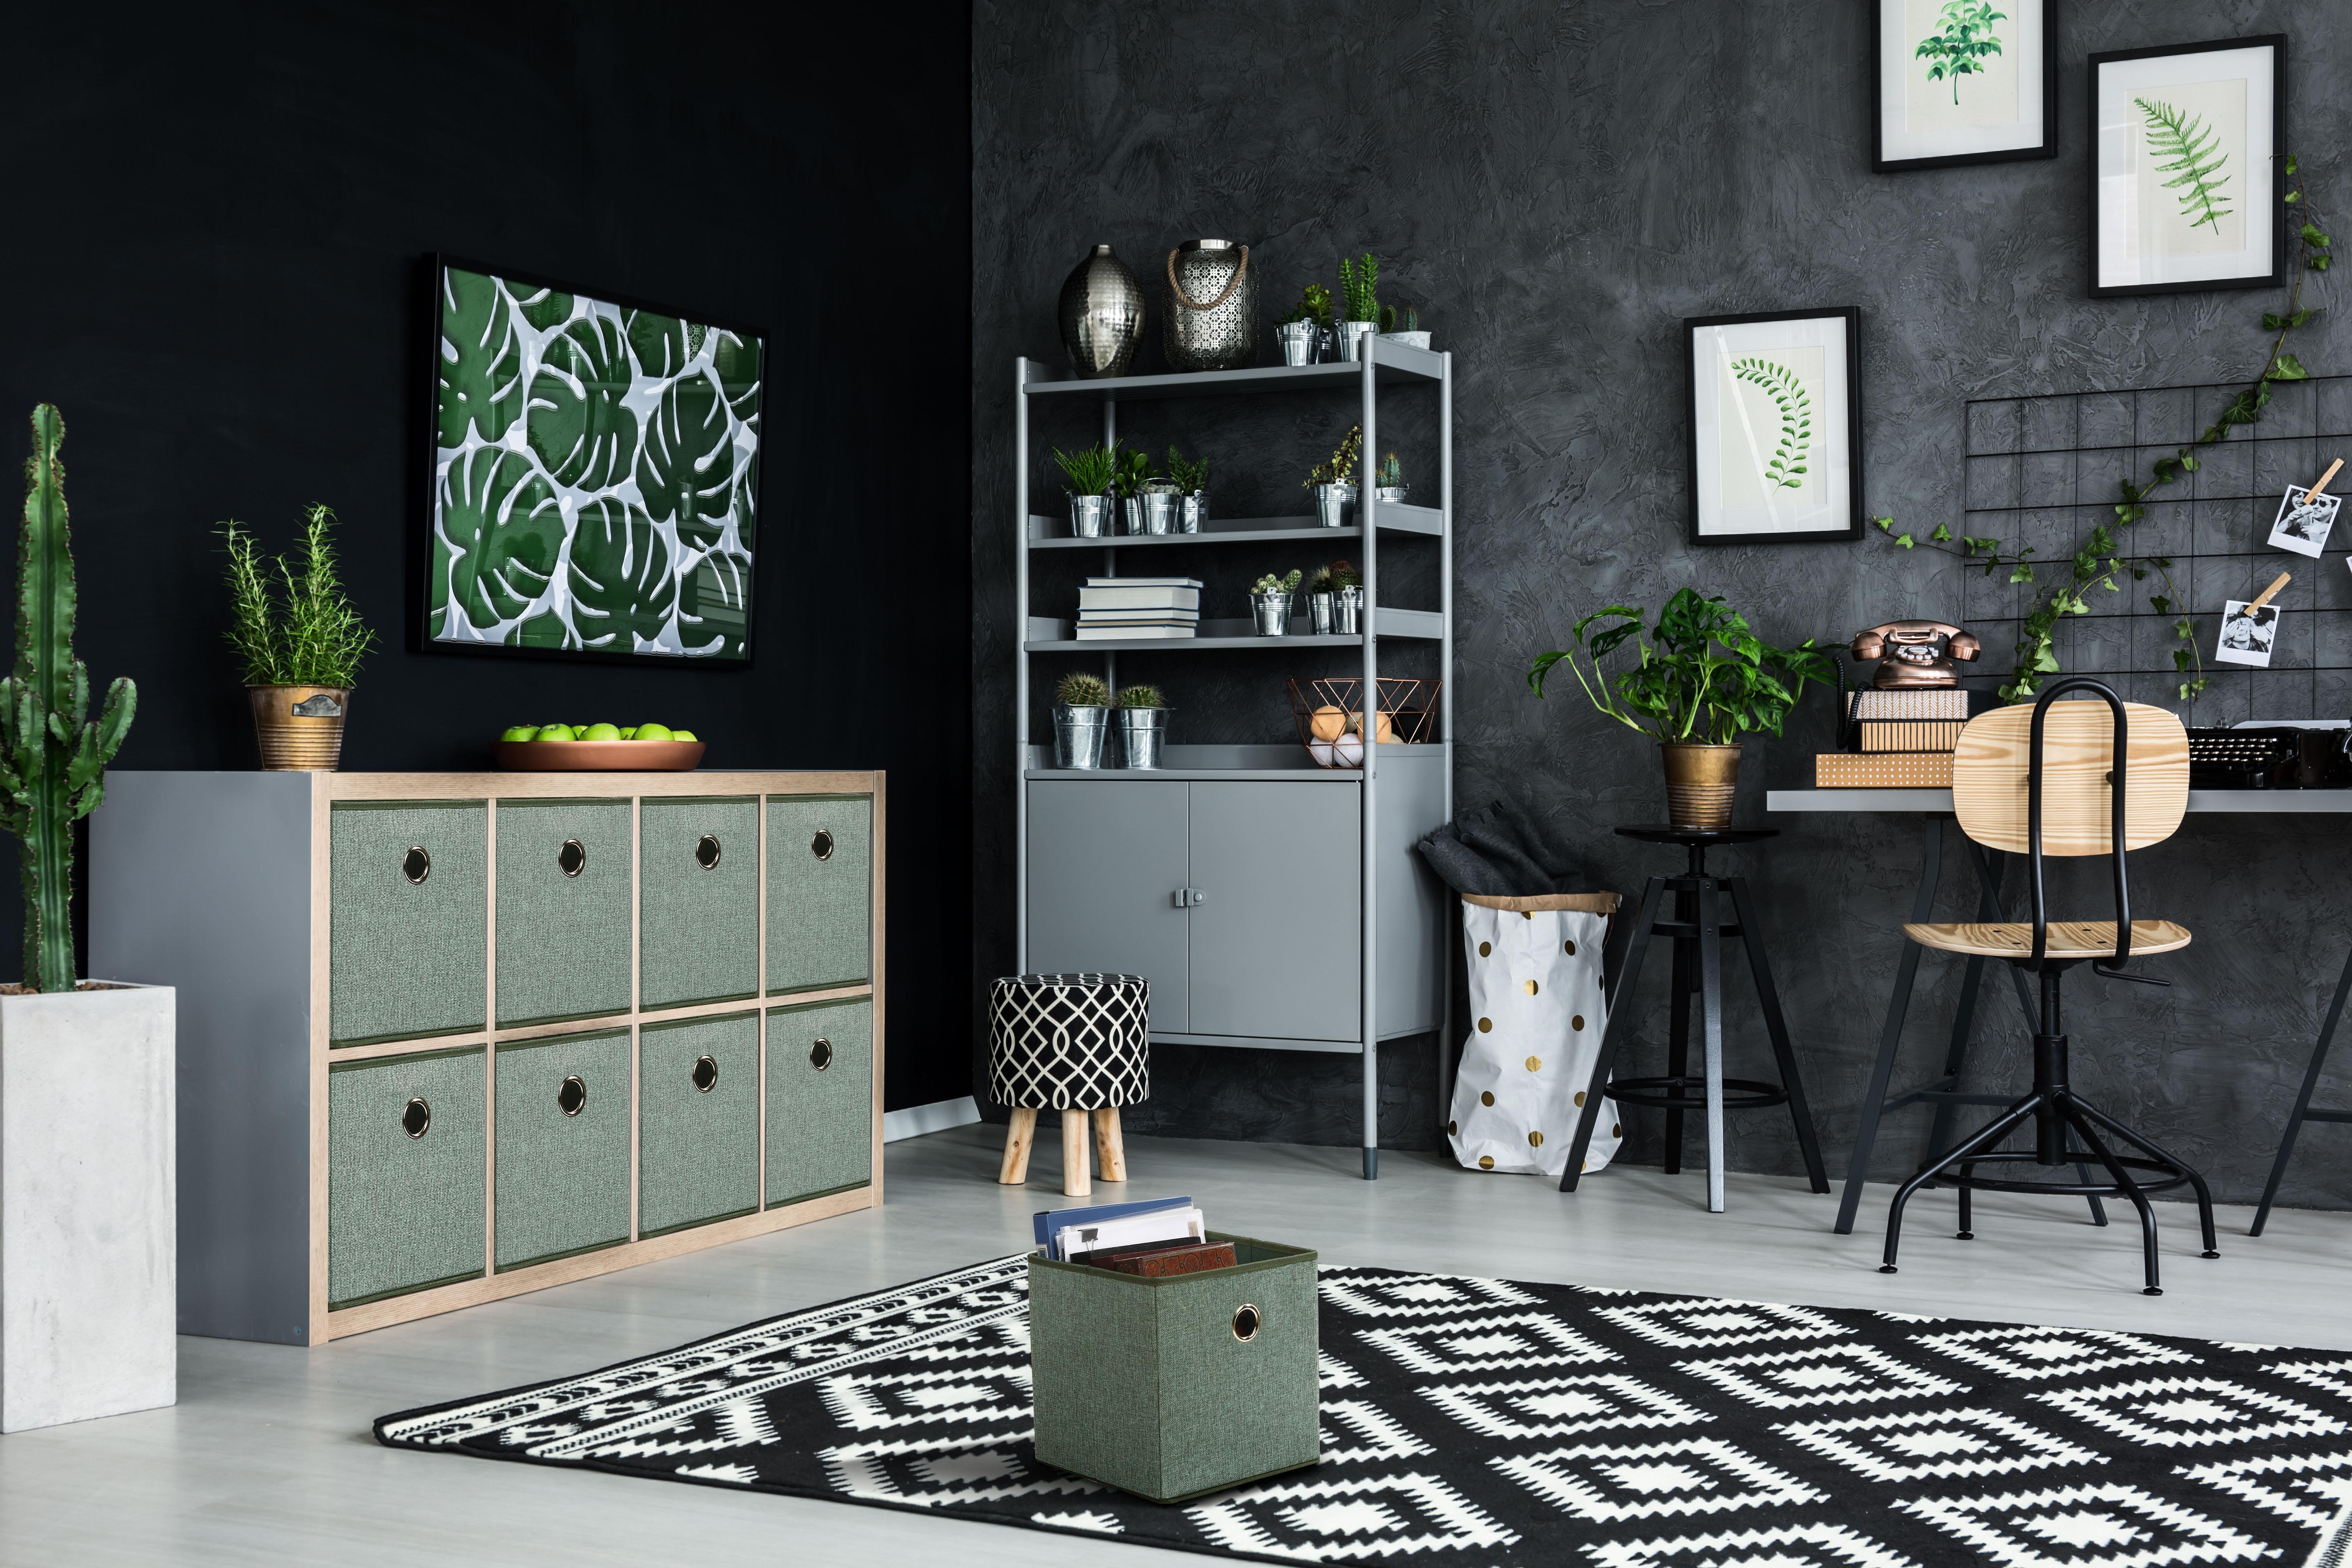 #601 green lifestyle